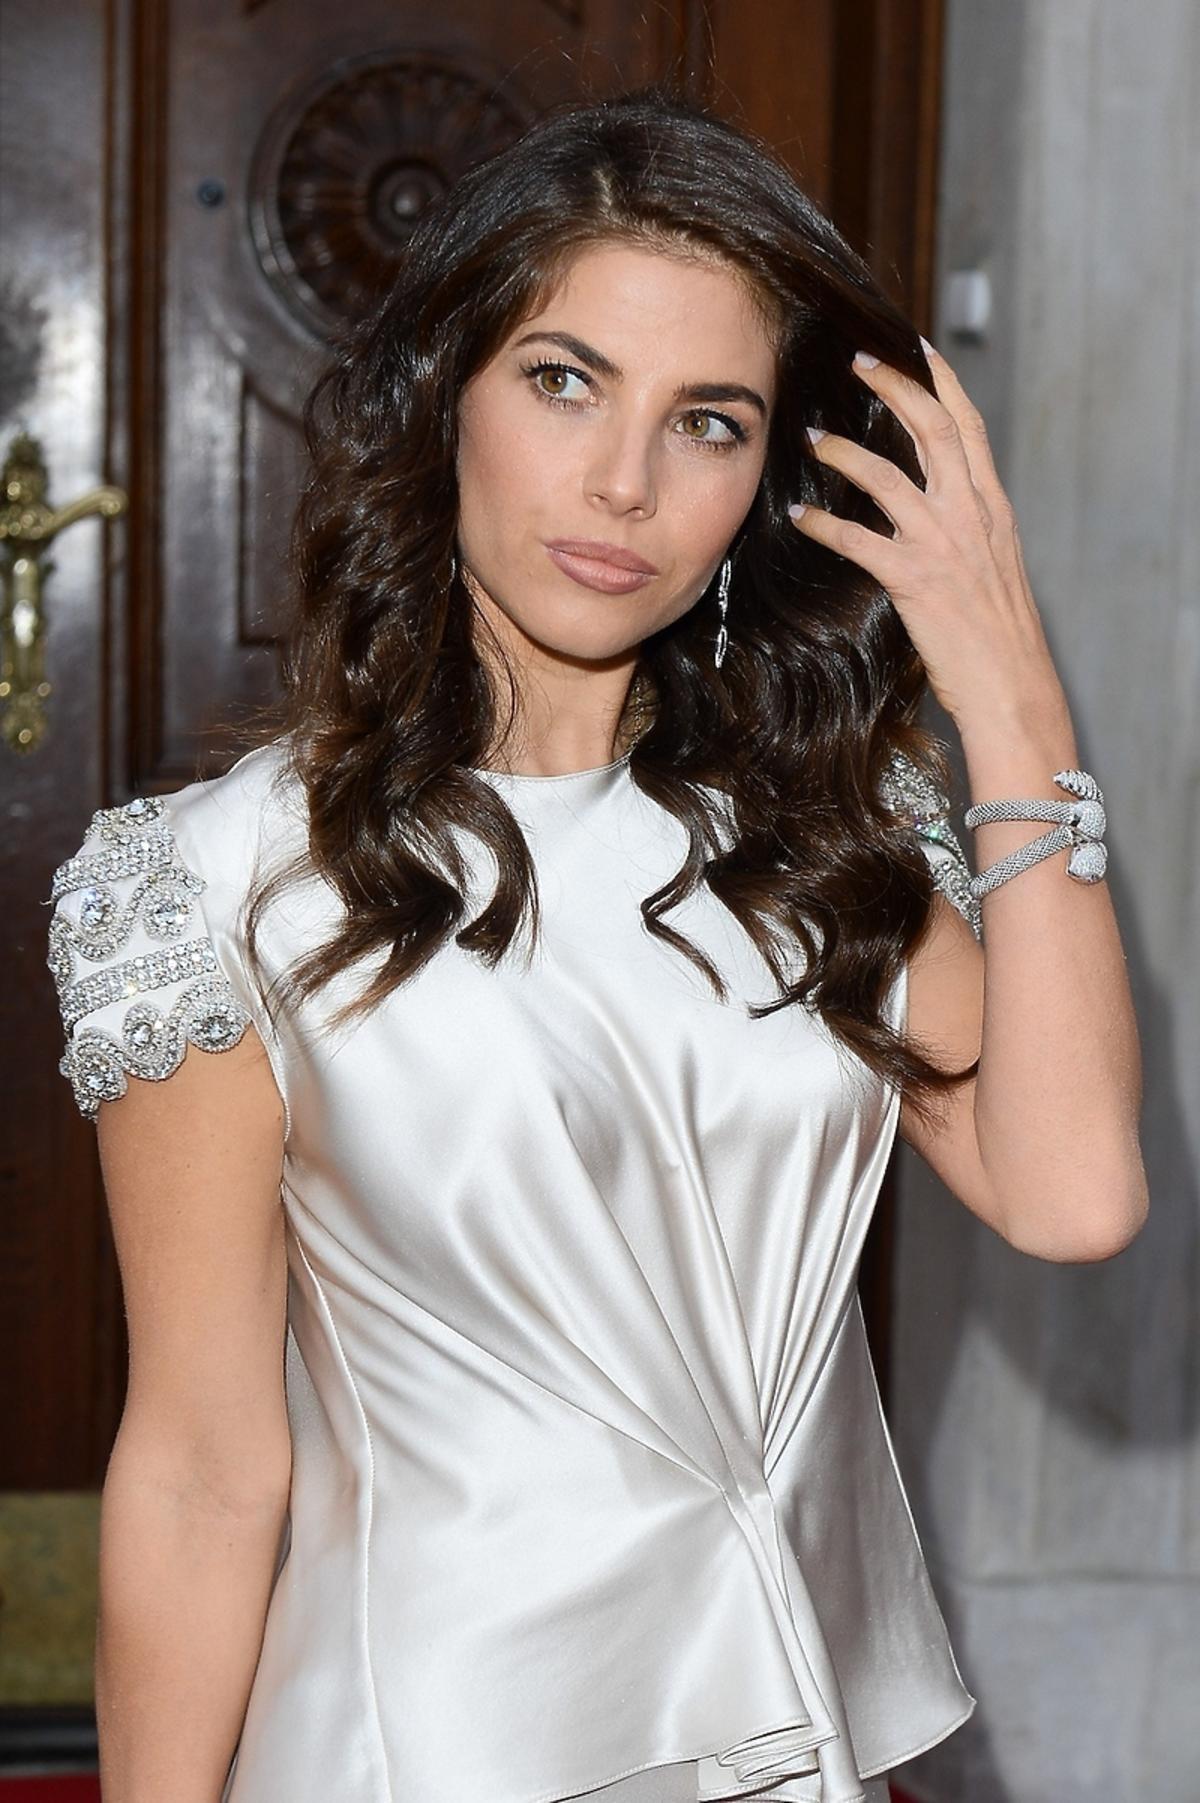 Weronika Rosati w srebrnej sukience z cekinami